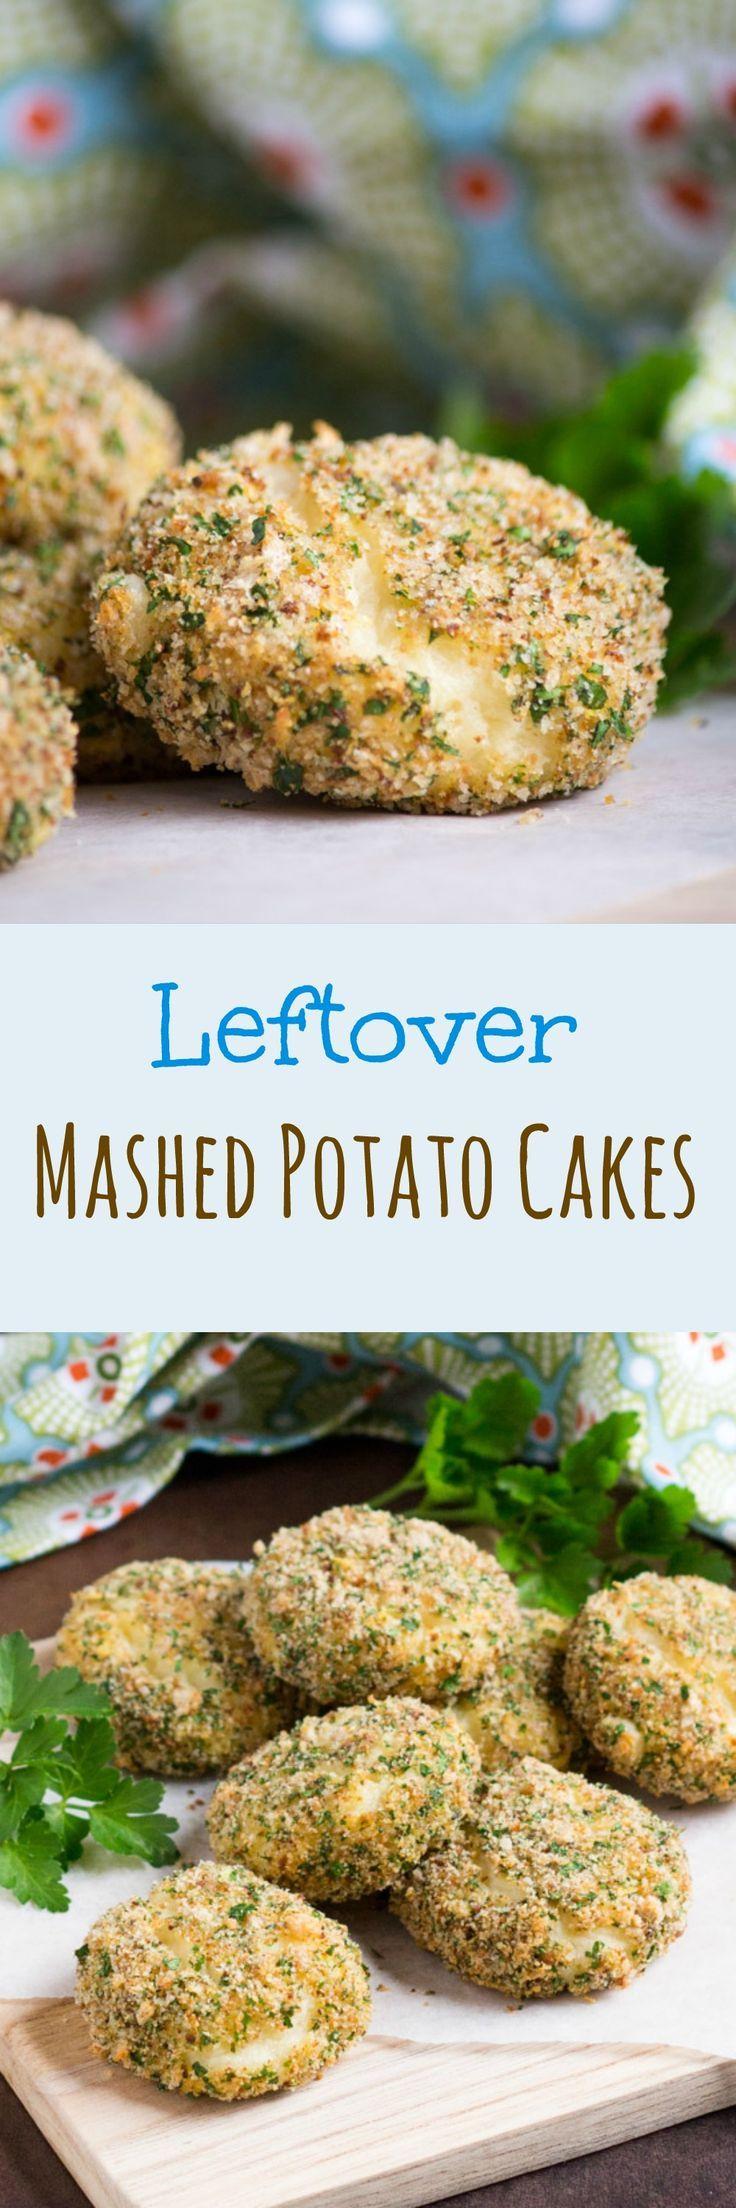 Leftover Mashed Potato Cakes ,  #Appetizers #cakes #Drink #Food #Fruits #leftover #Mashed #MealPlan #MealPlanning #Meat #Planning #Potato #Snacks